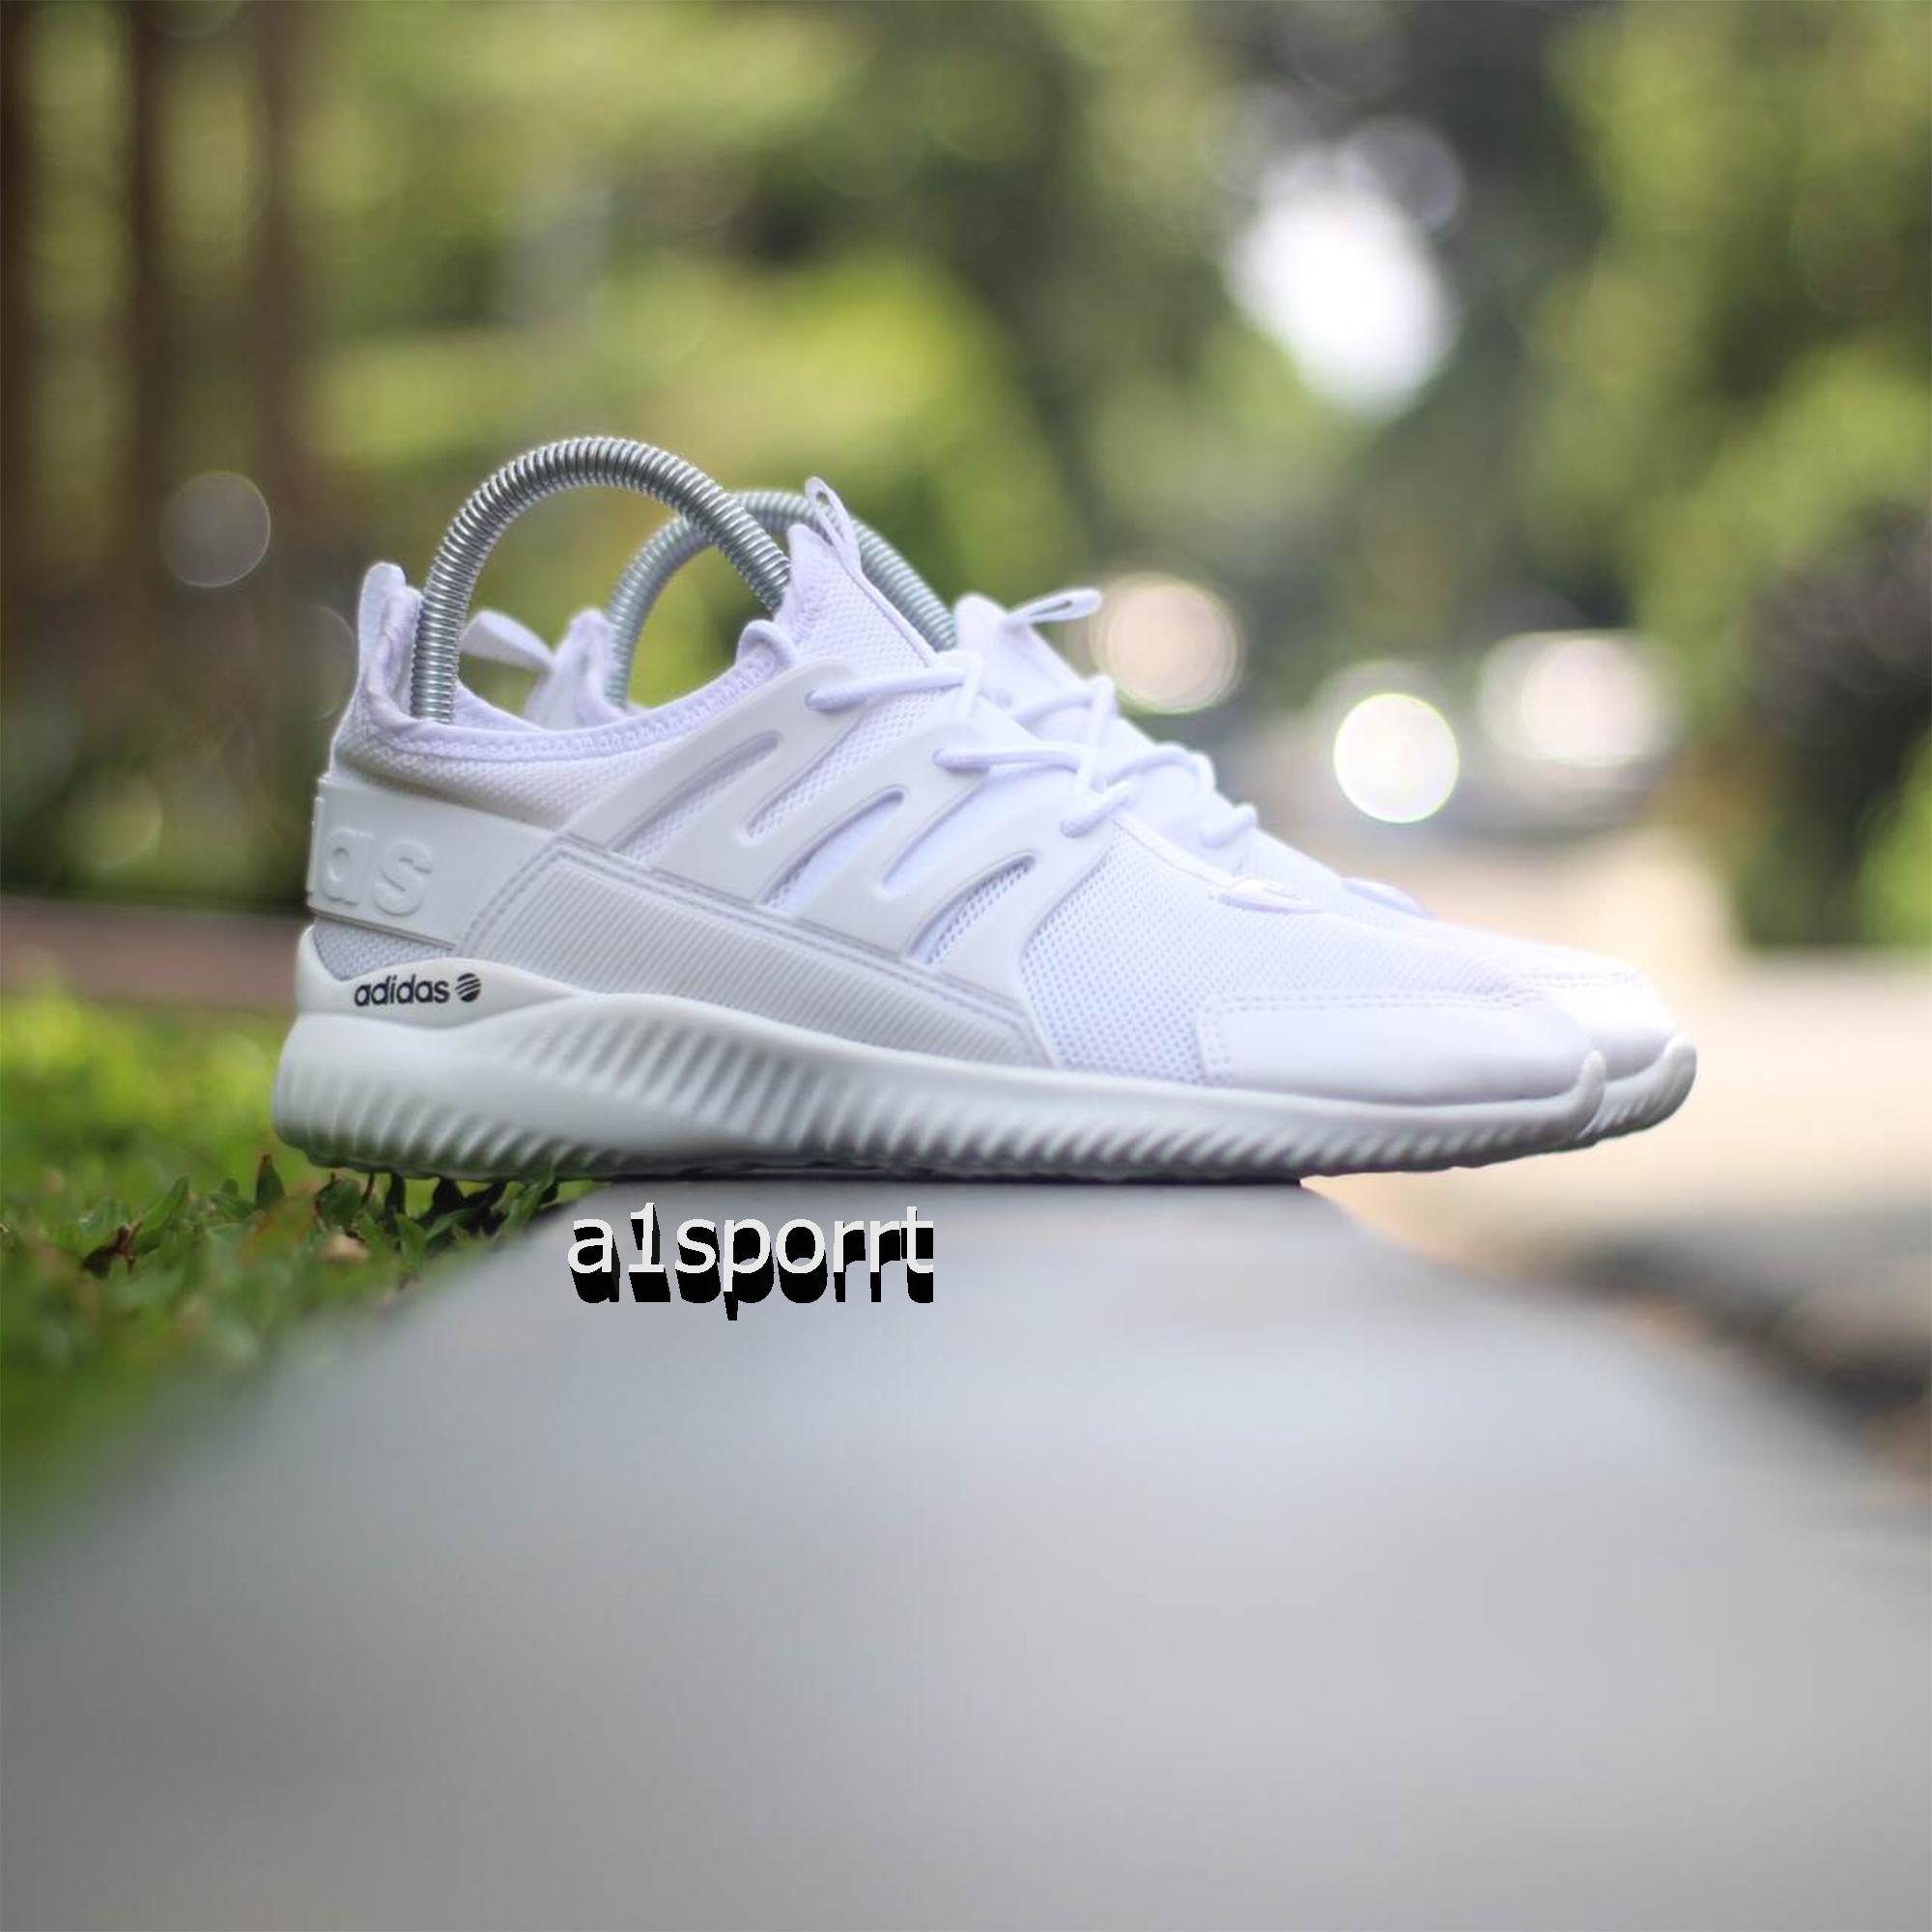 Sepatu Murah Adidas Alphabounce Kualitas Premium Putih